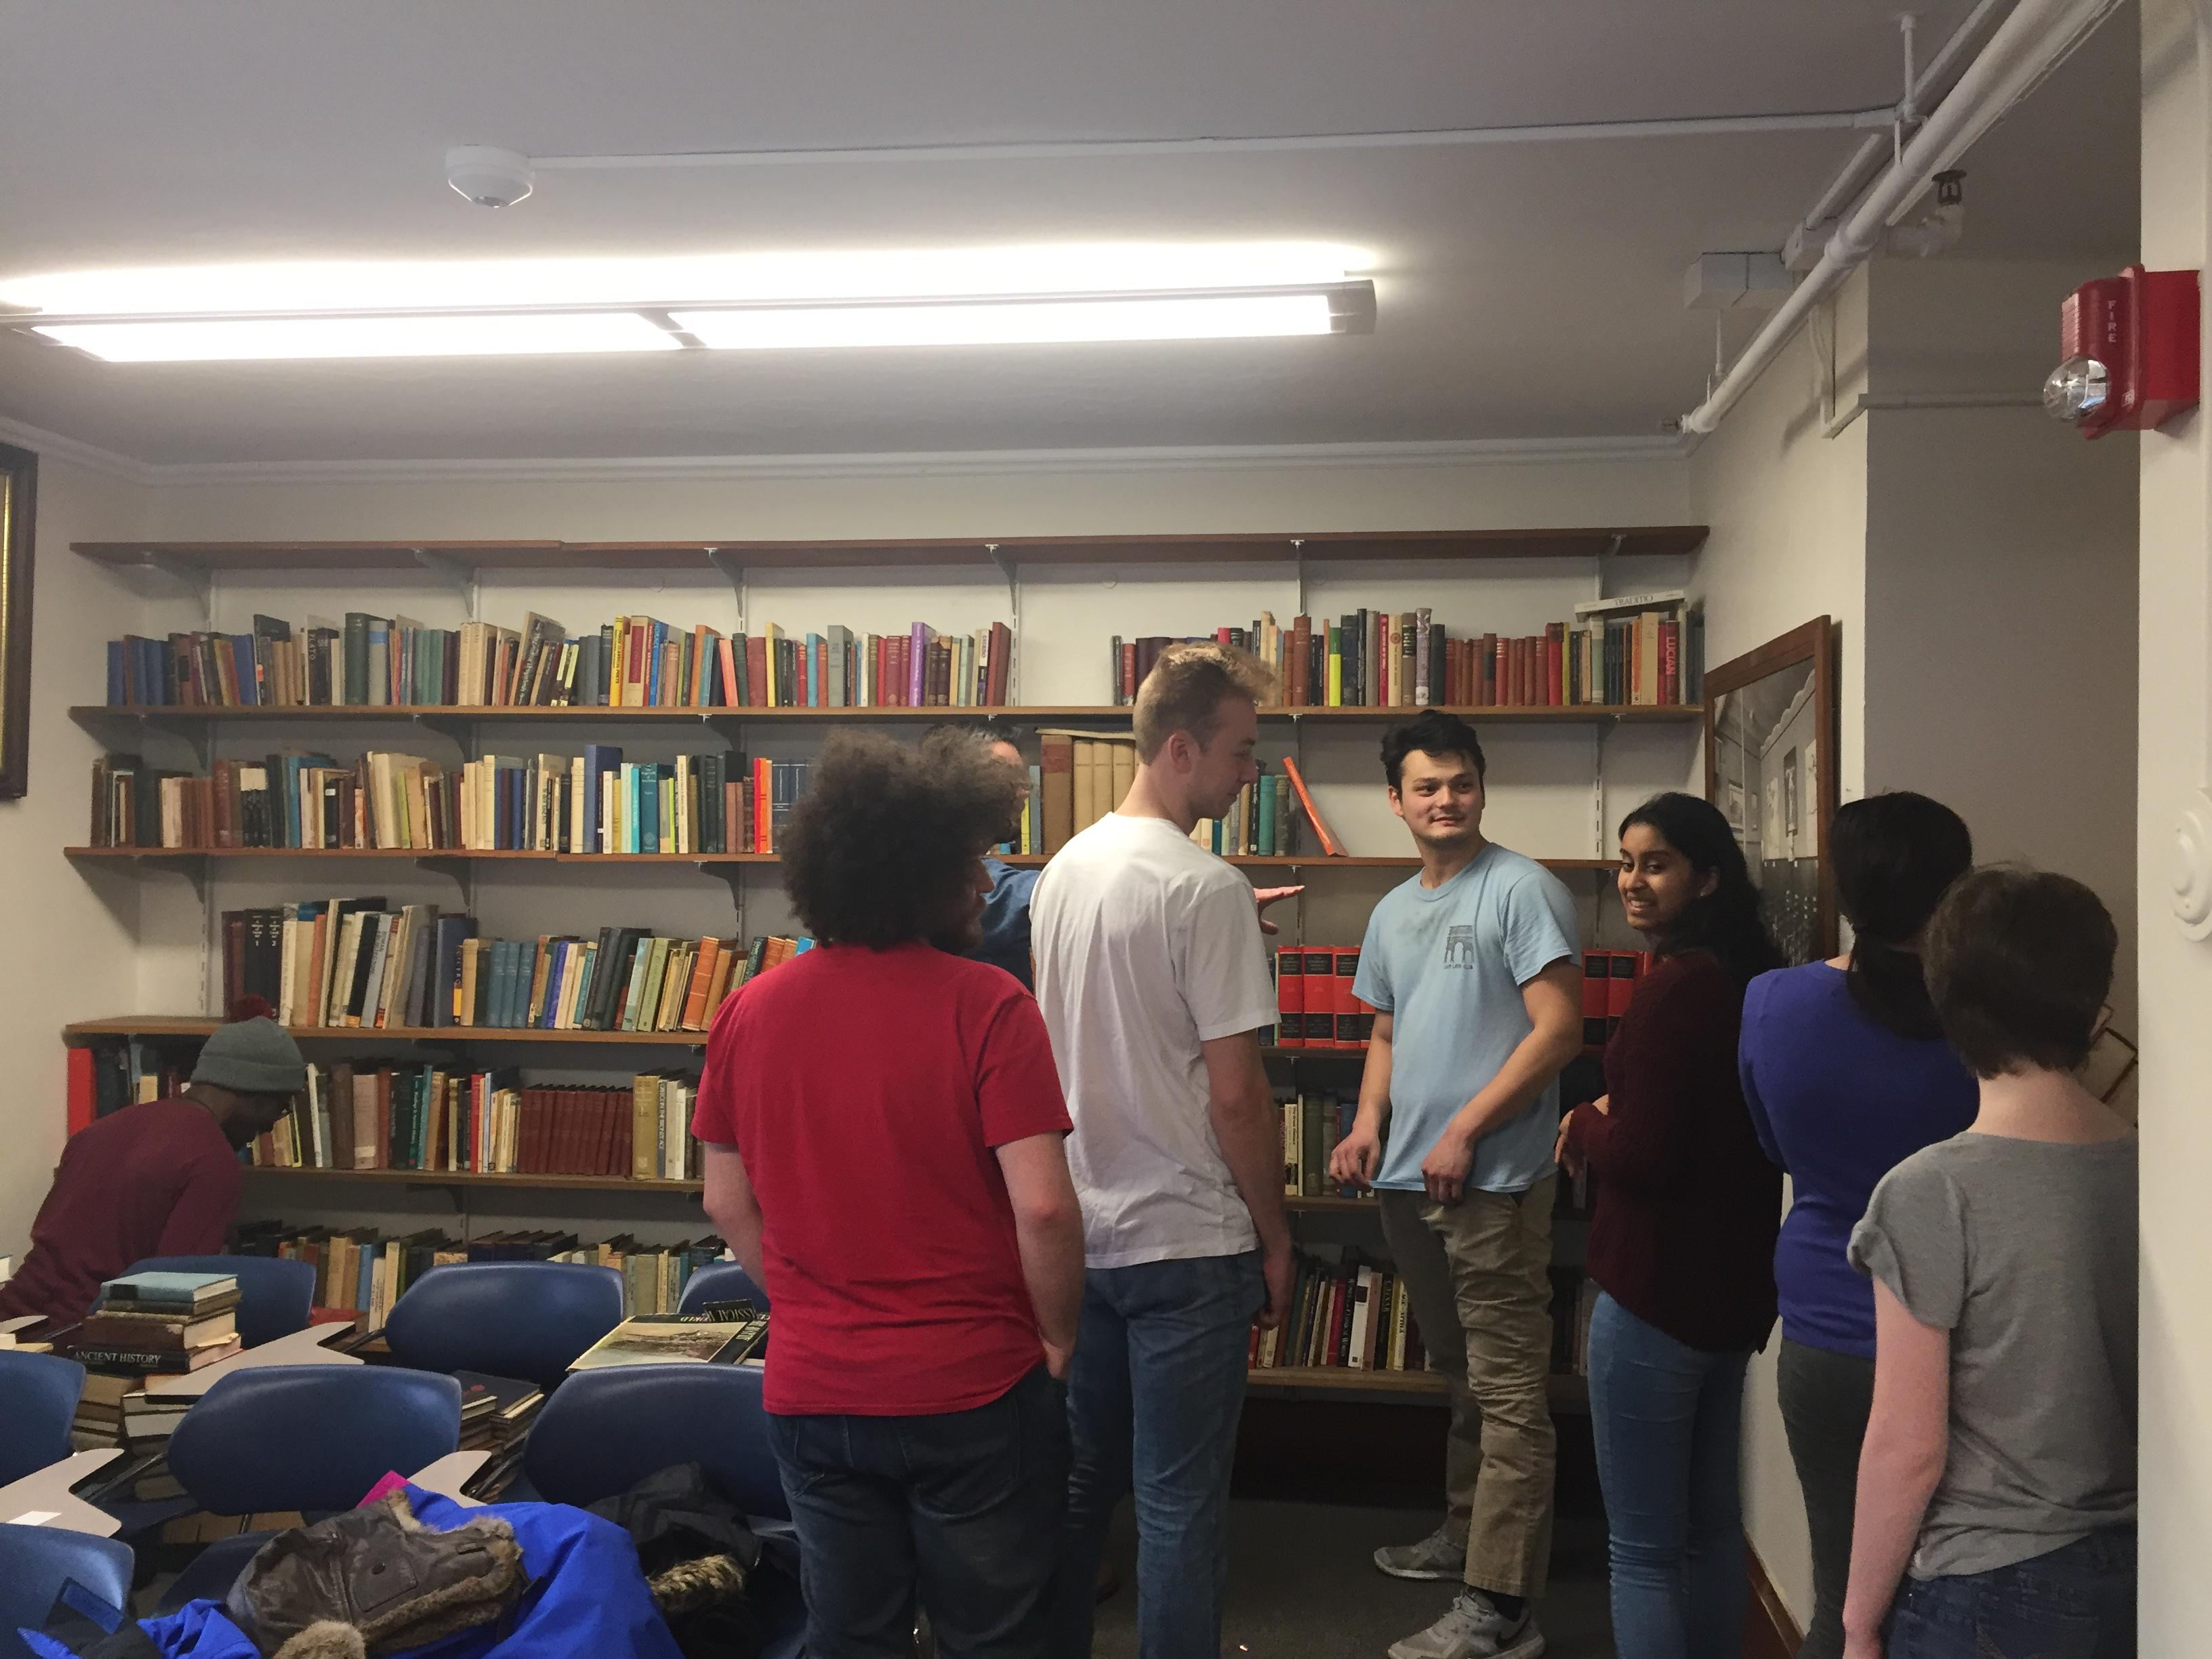 Classics students help organize the department's books (from L to R: Nana Yorke, Adam Doros, Dr. Paul Hay in the back, Colin Hawkinson, Joshua Breckenridge, Asha Ravichadran, Dominica Rollins, and Justine Boyle).